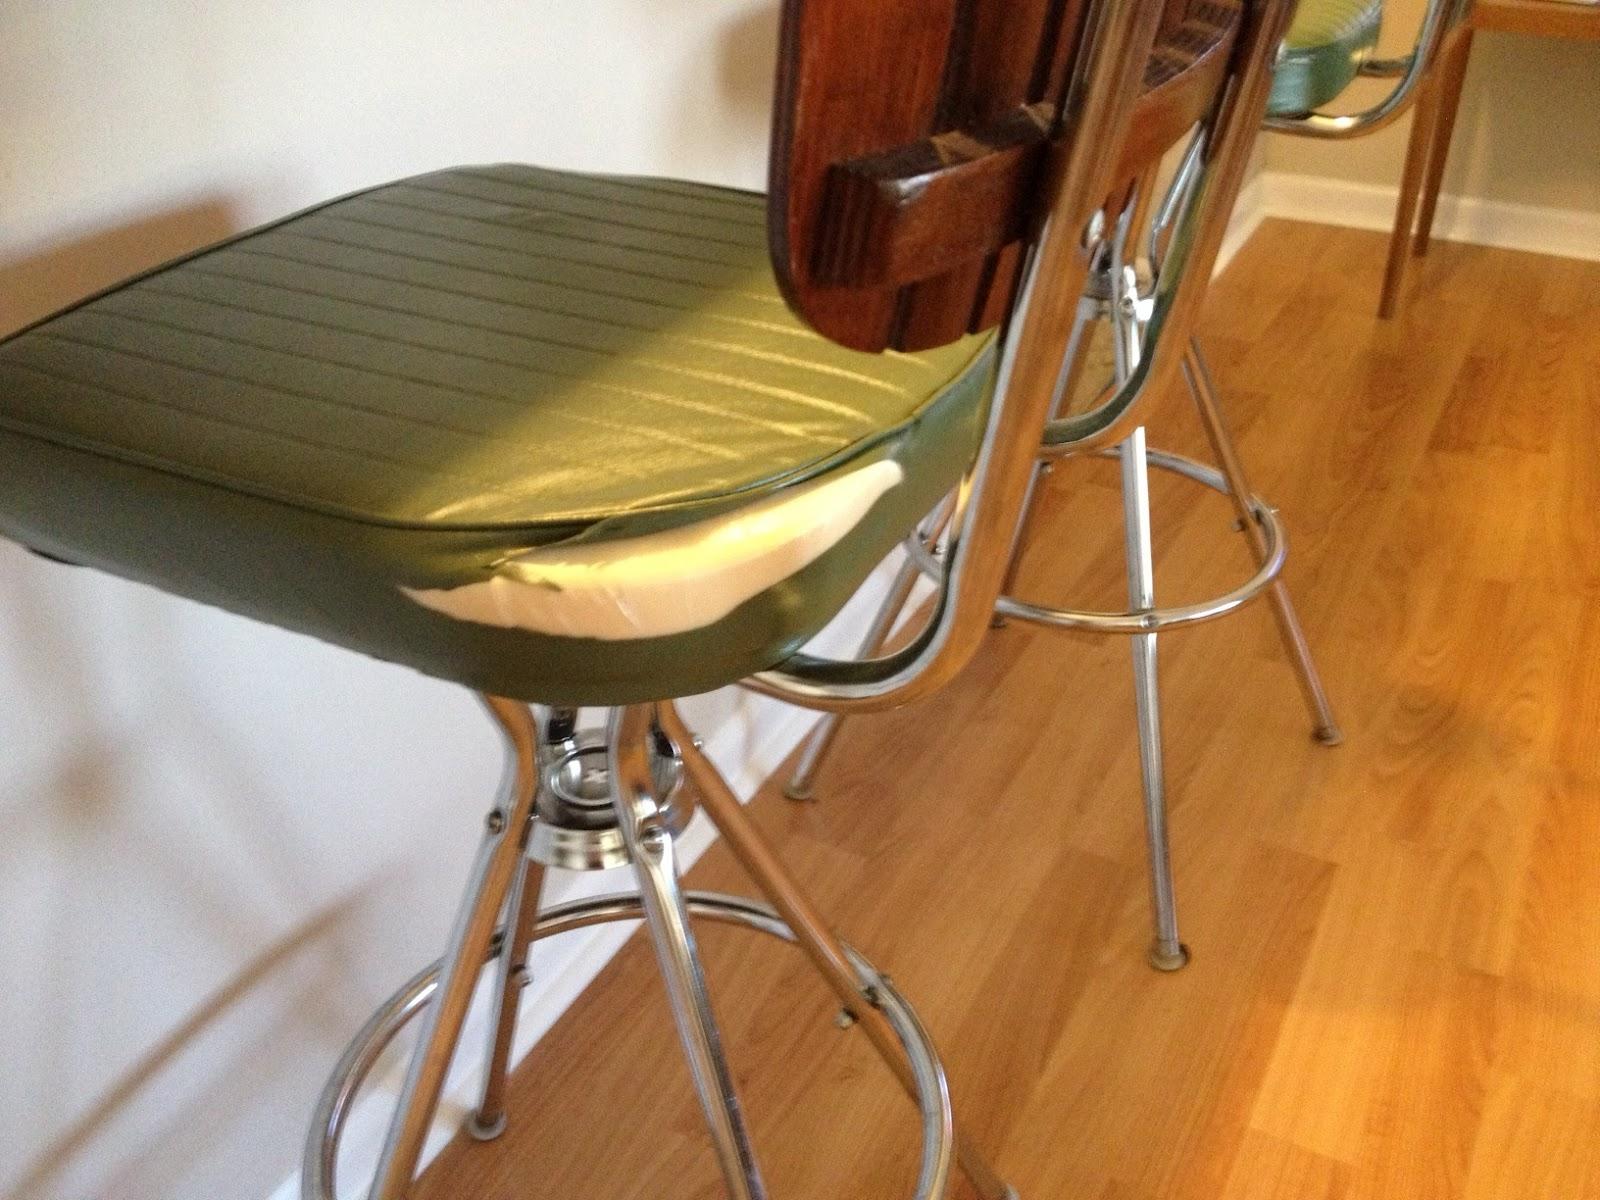 Always a Project Cool Stools Man : stool3 from alwaysaproject.blogspot.com size 1600 x 1200 jpeg 320kB